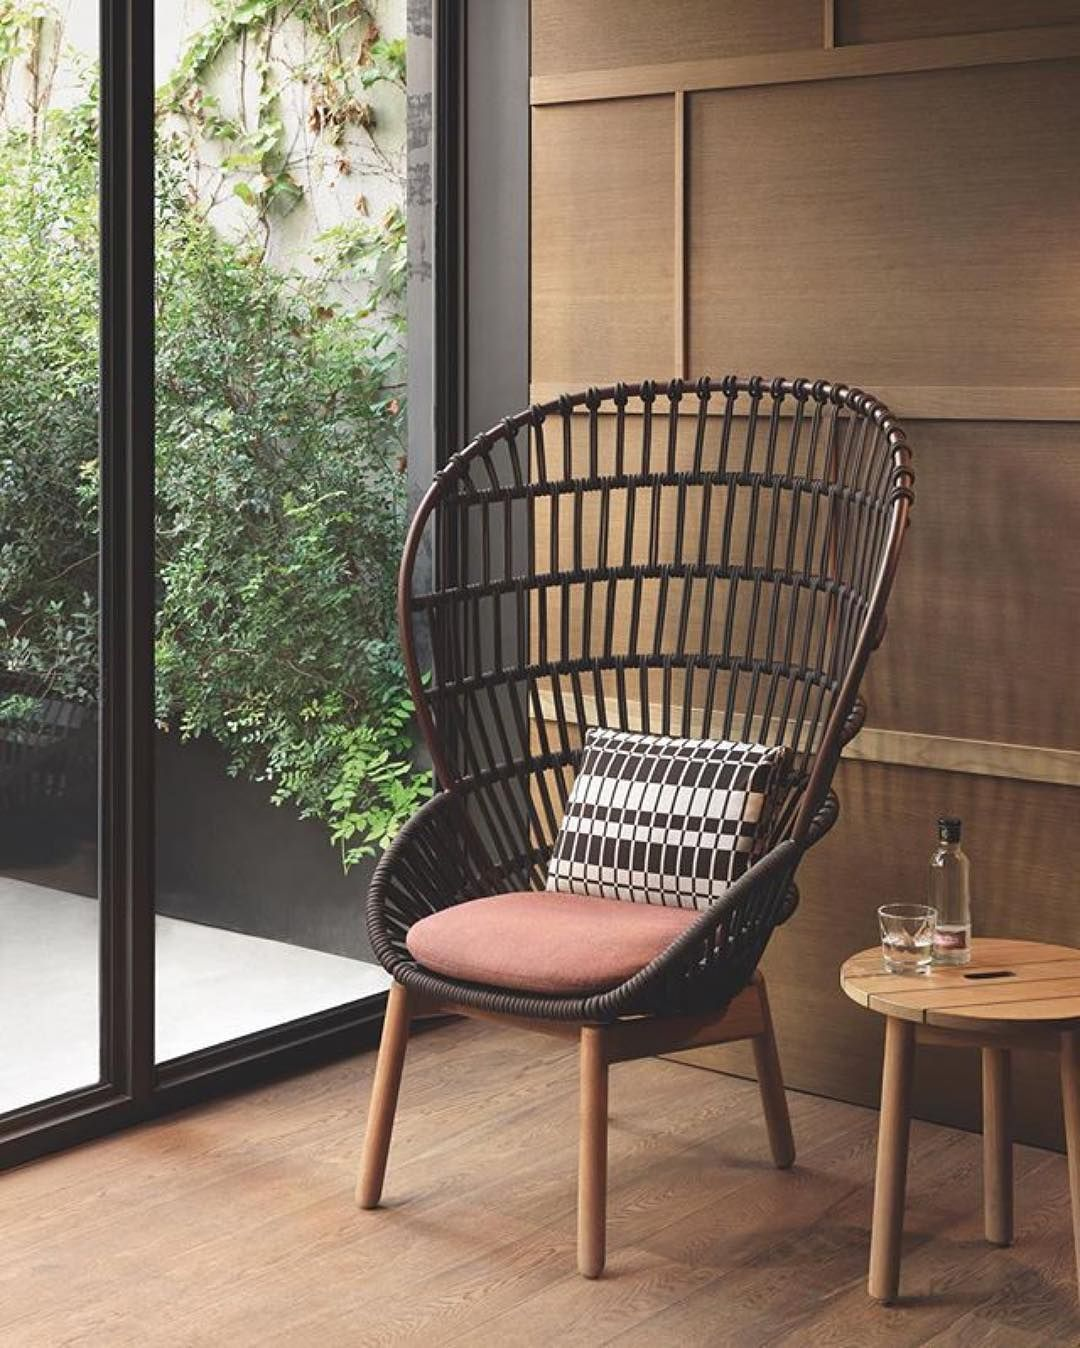 #Repost @doshilevien Cala Armchair Designed By Doshi Levien For Kettal.  Metal Frame Woven Home Design Ideas